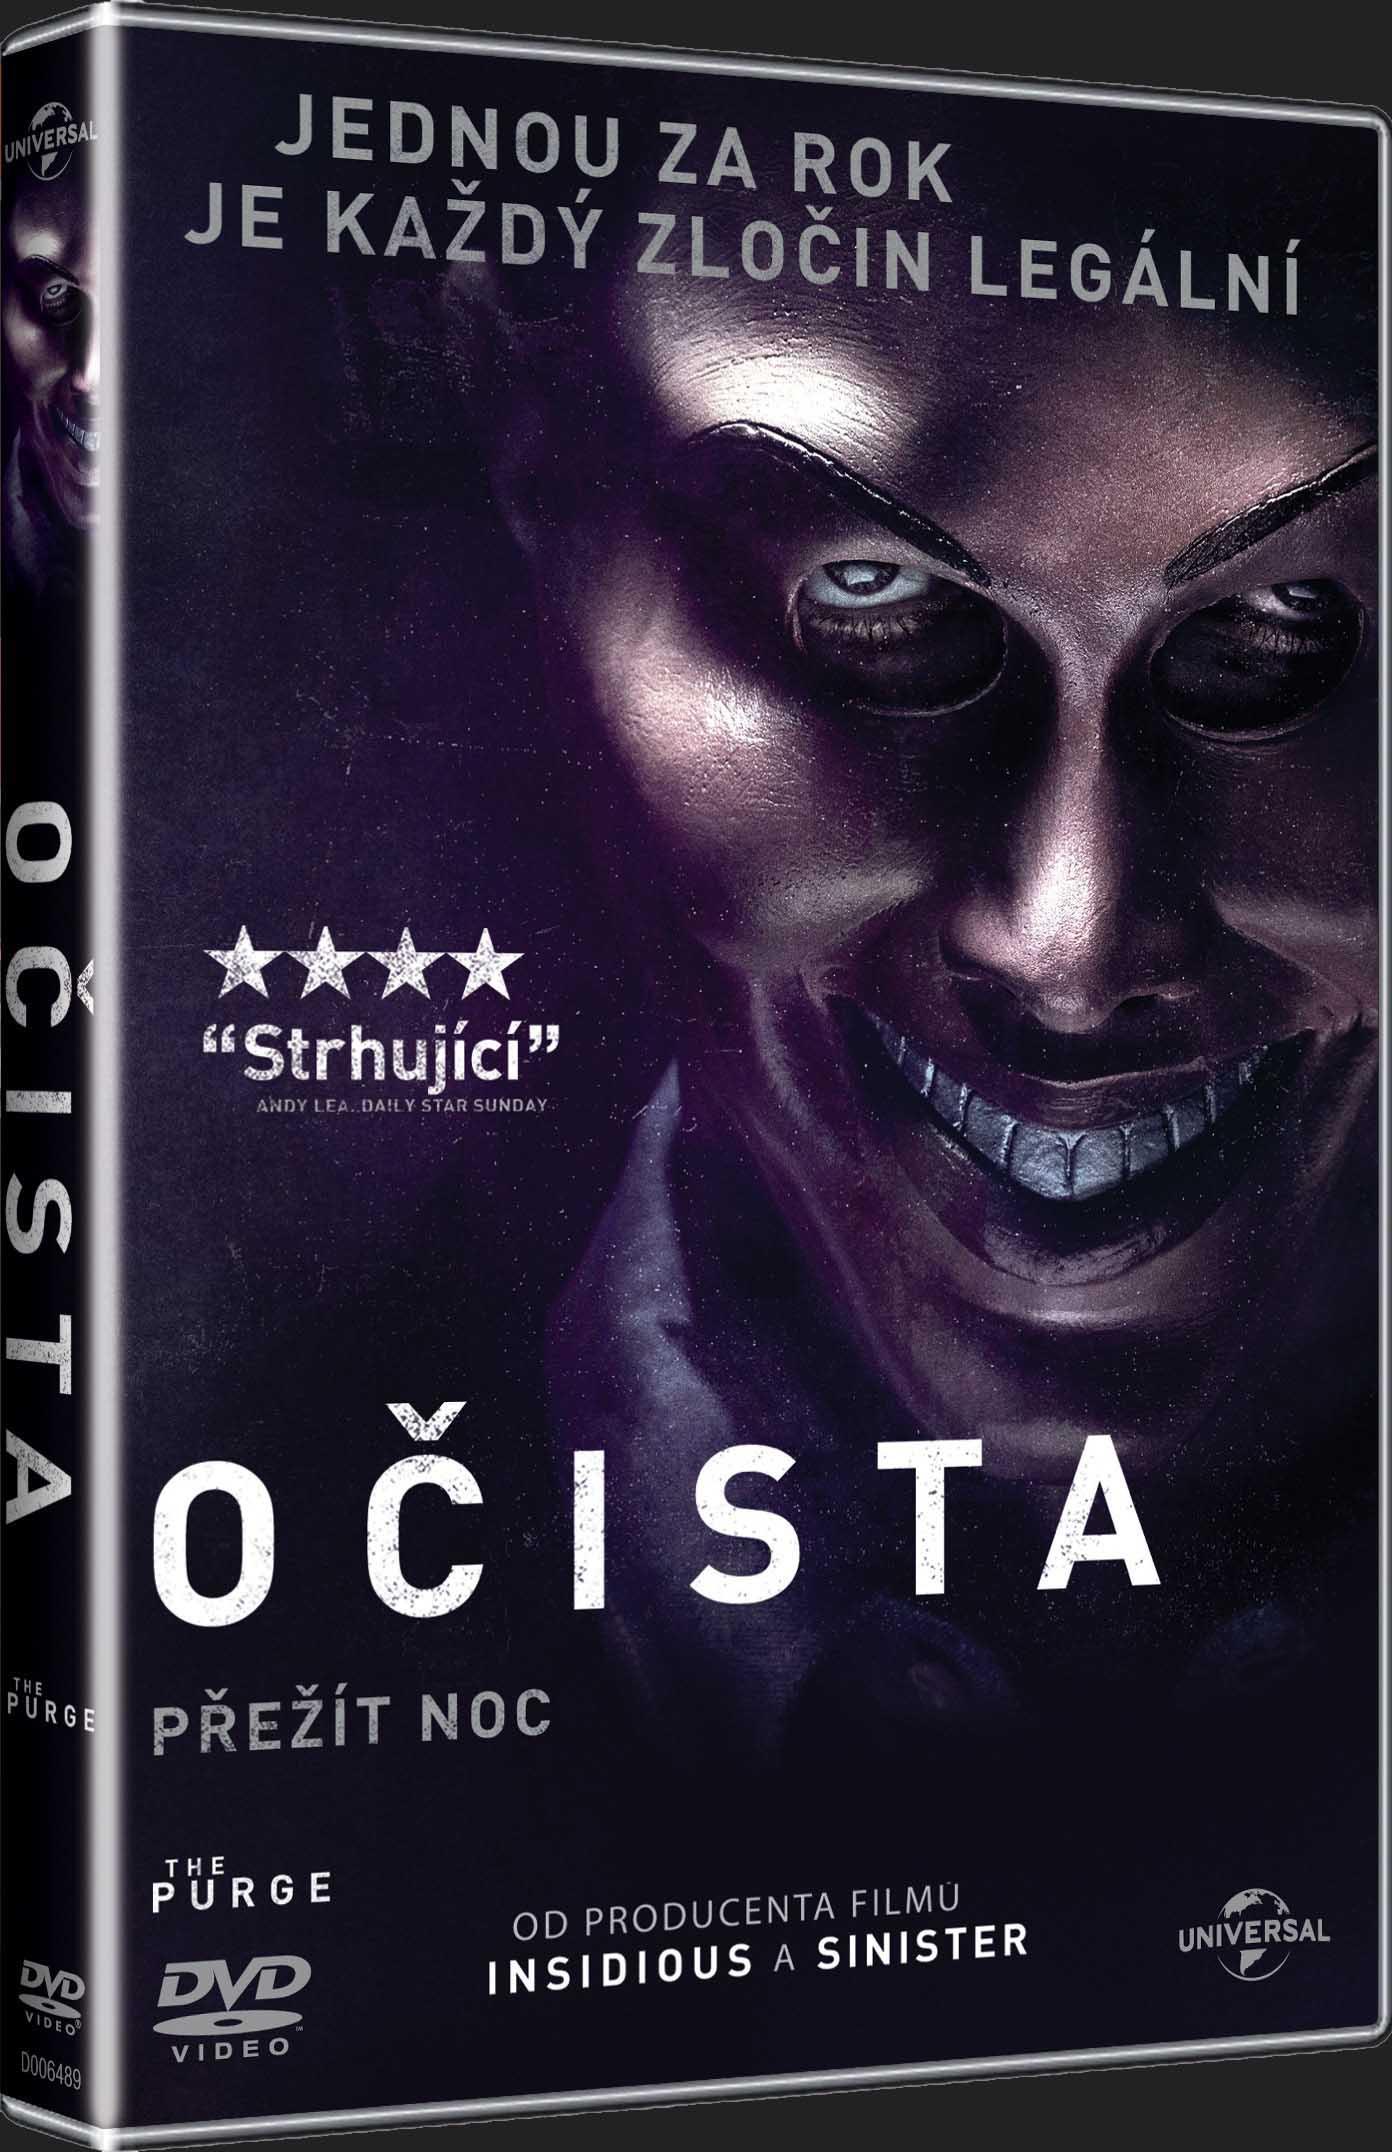 OČISTA - DVD